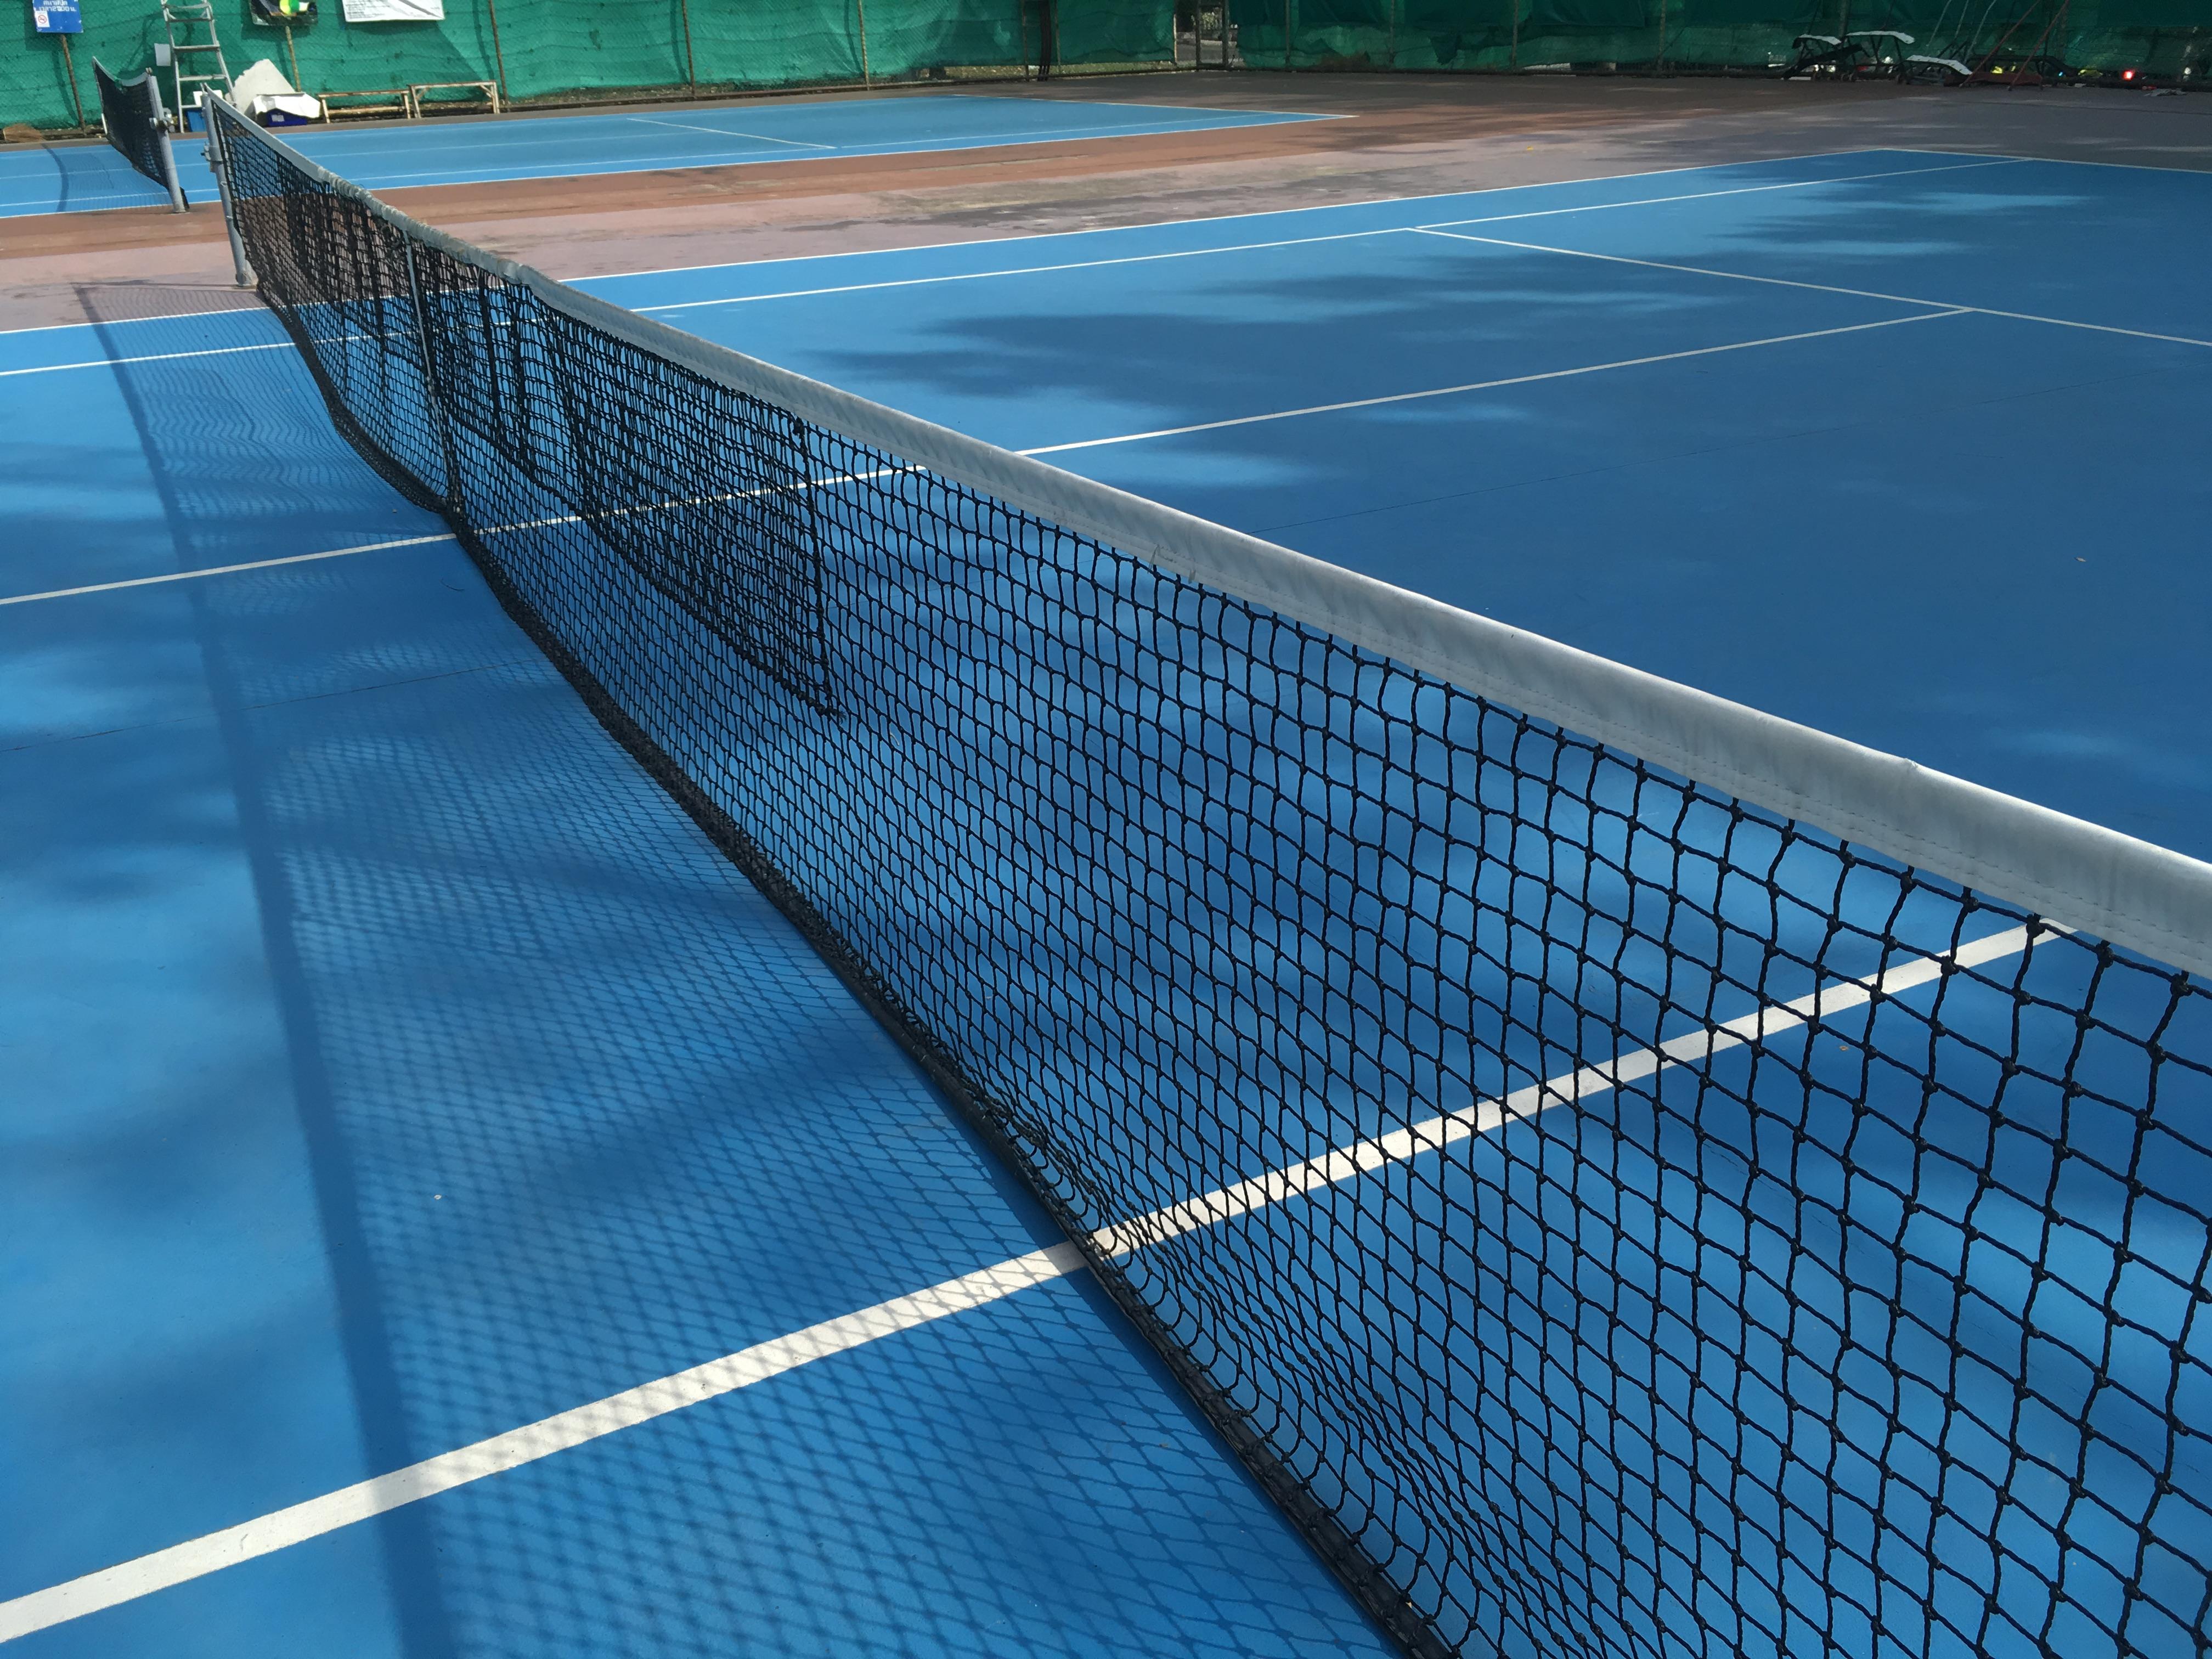 ari駅のテニスコート